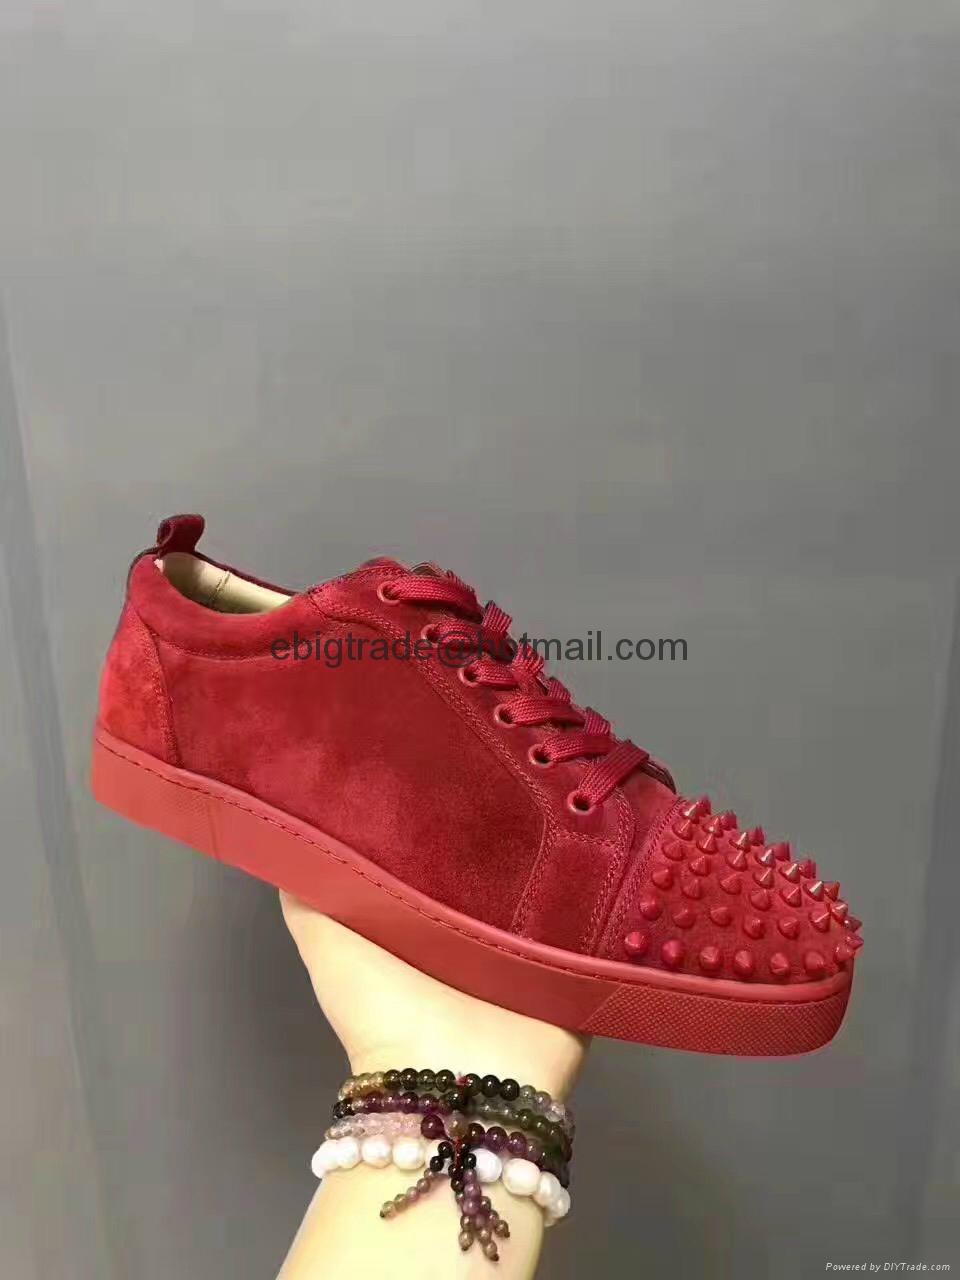 Christian Louboutin sneakers men